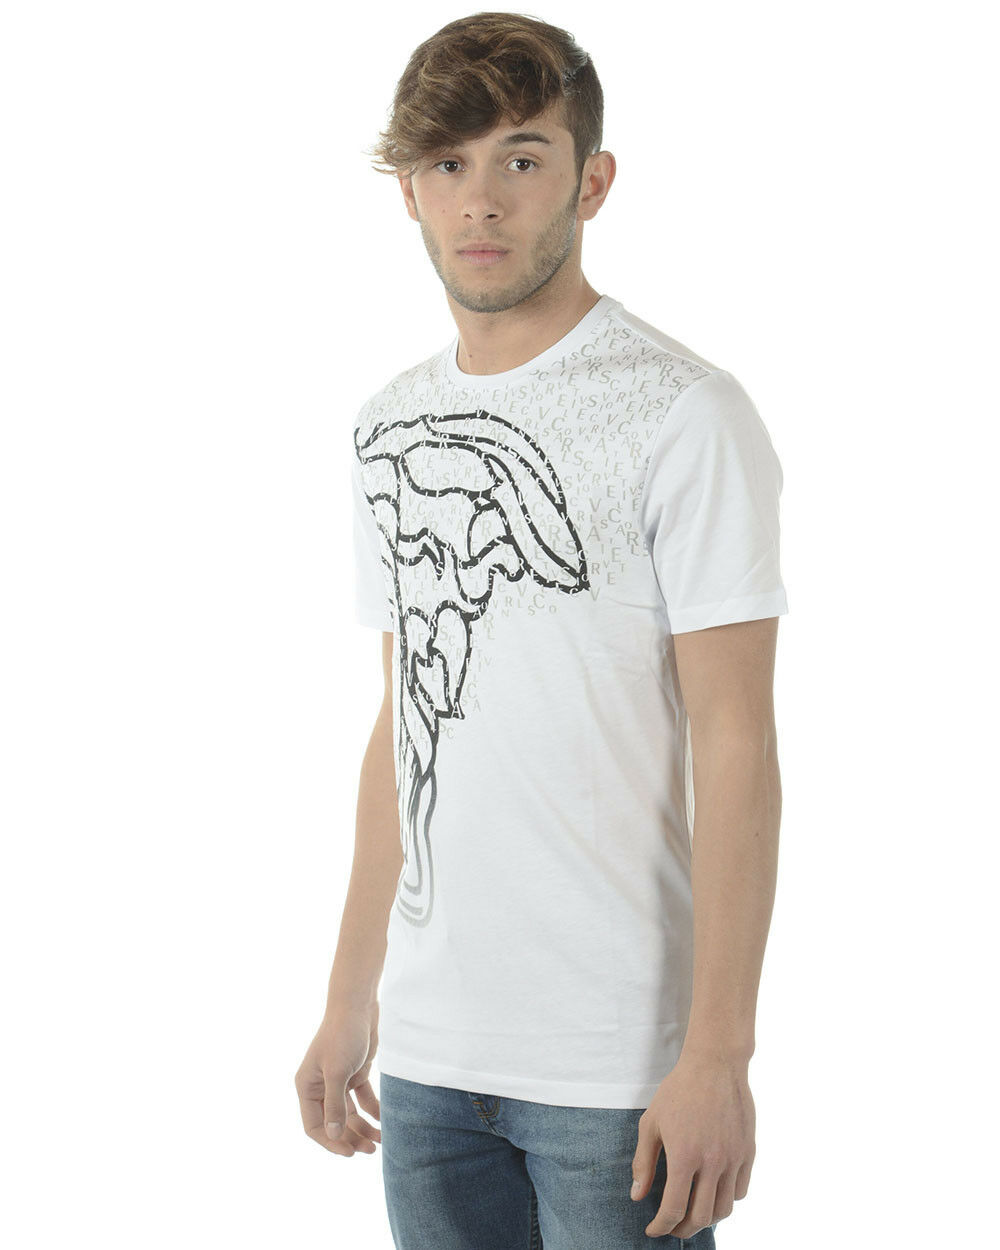 T shirt V800683SVJ00353 Versace Collection Sweatshirt Cotone Uomo Bianco V800683SVJ00353 shirt V7001 a8076b